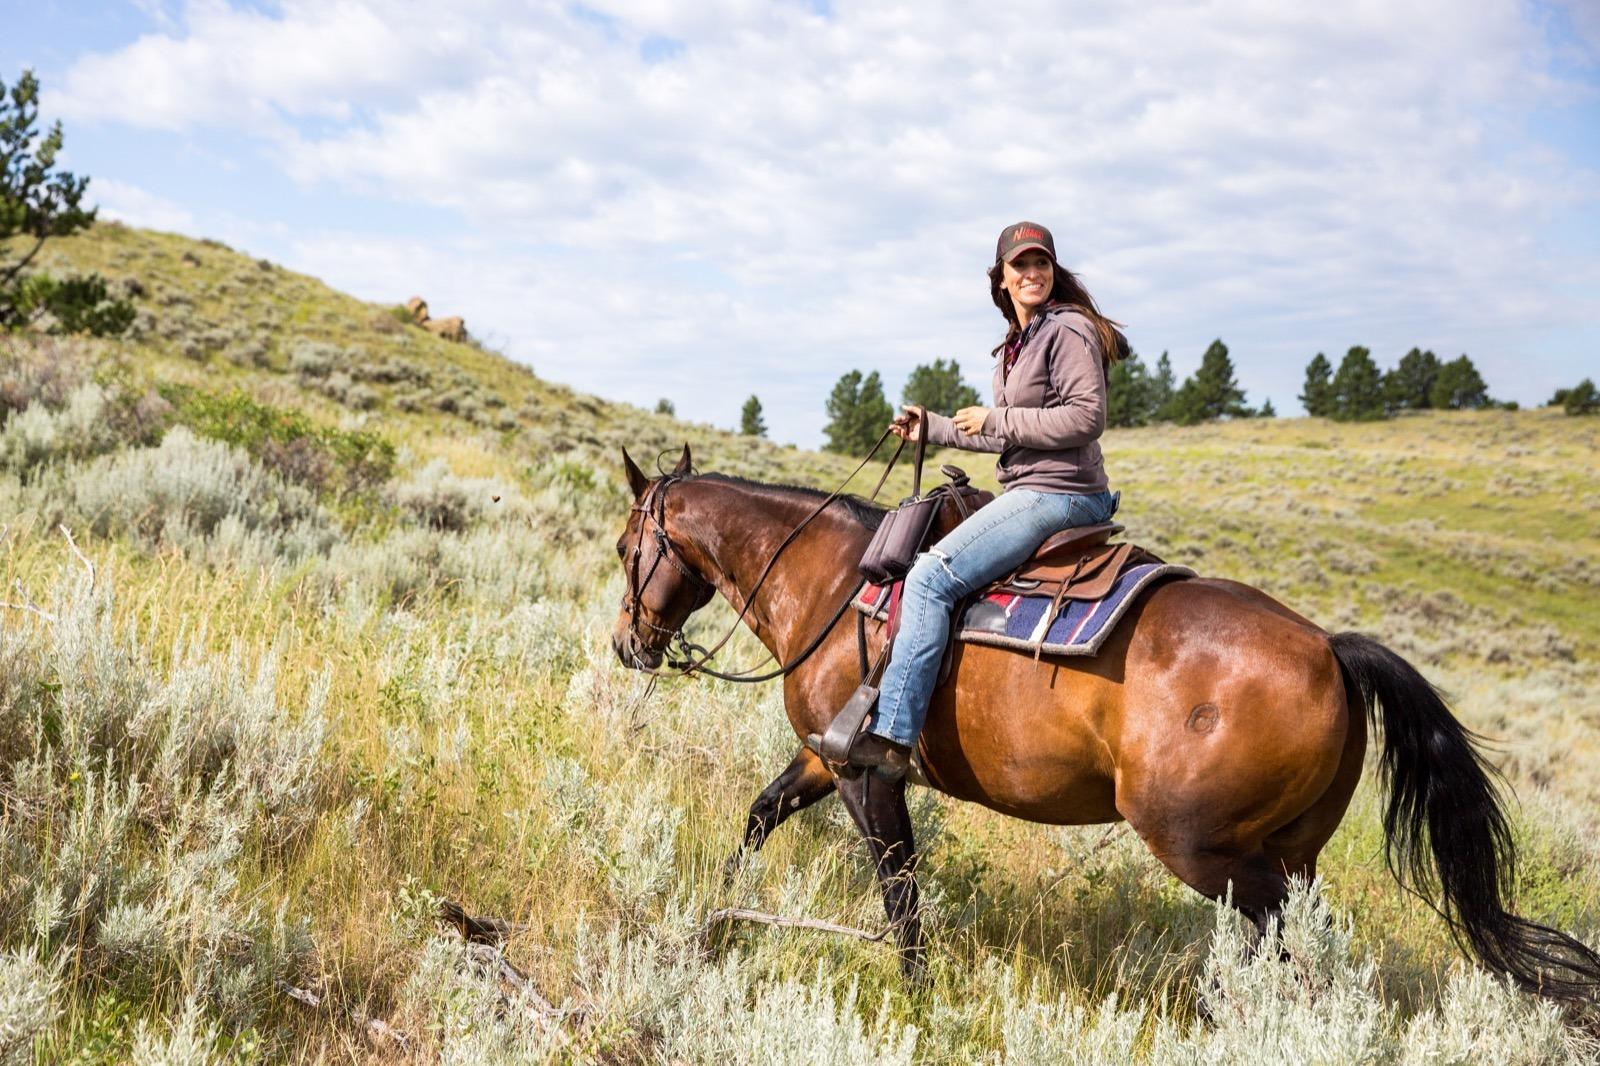 Go horseback riding on your Montana Road Trip.